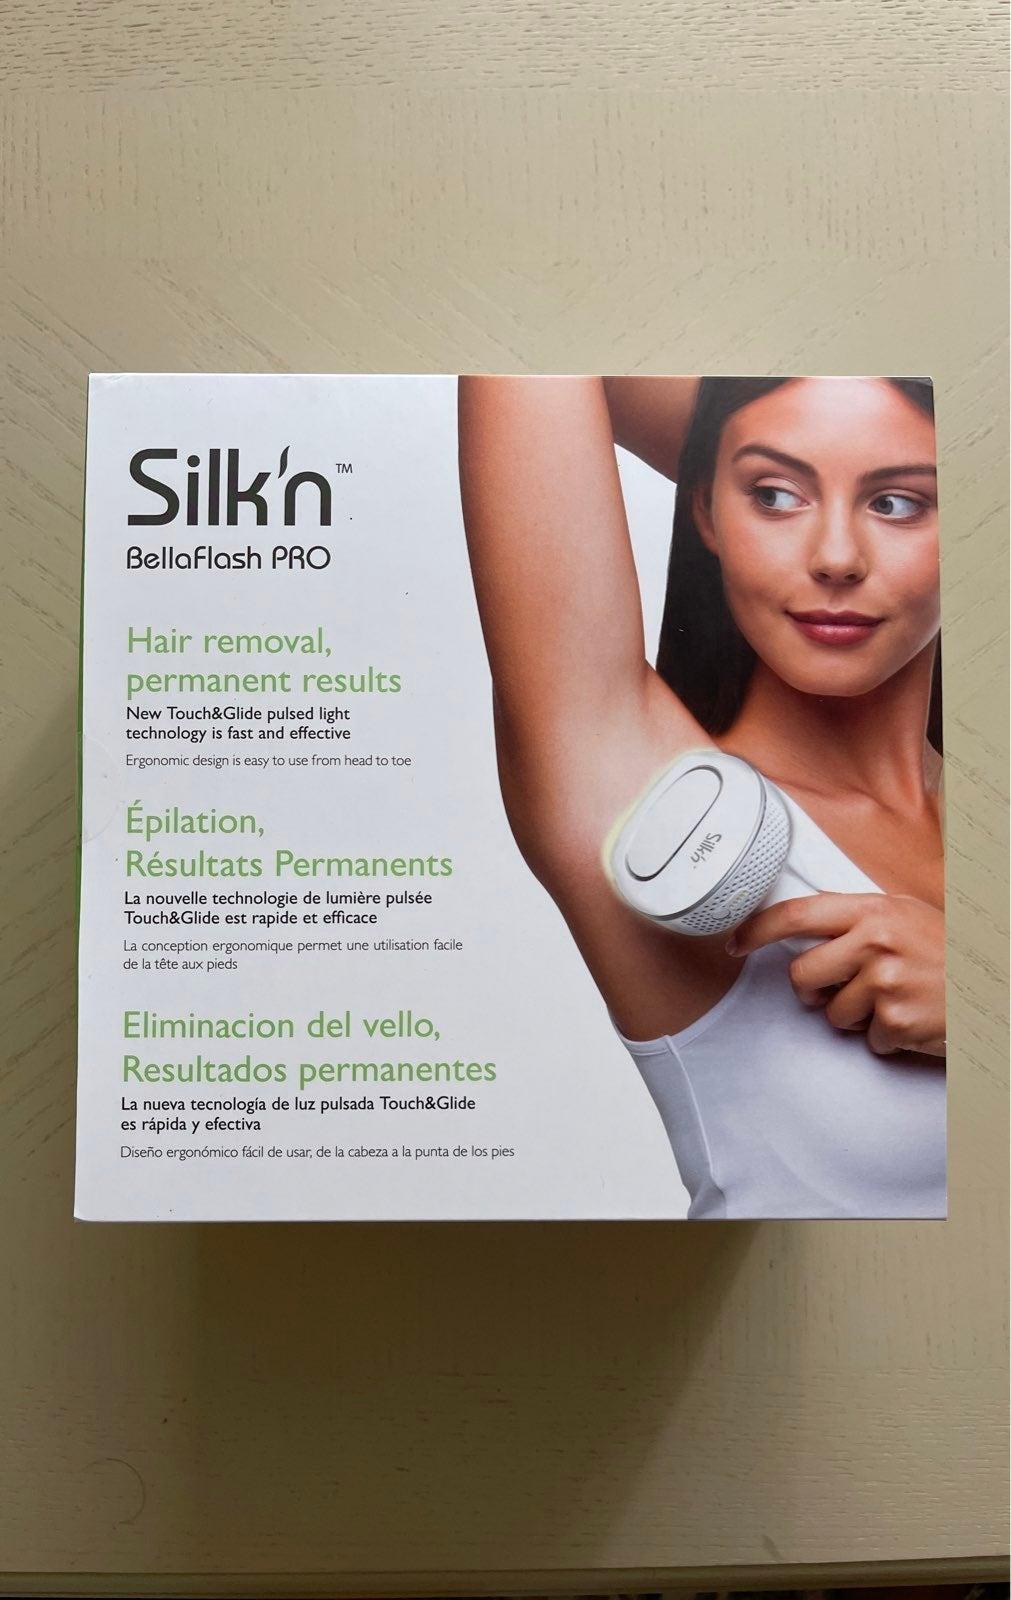 Silk'n BellaFlash Pro Brand New